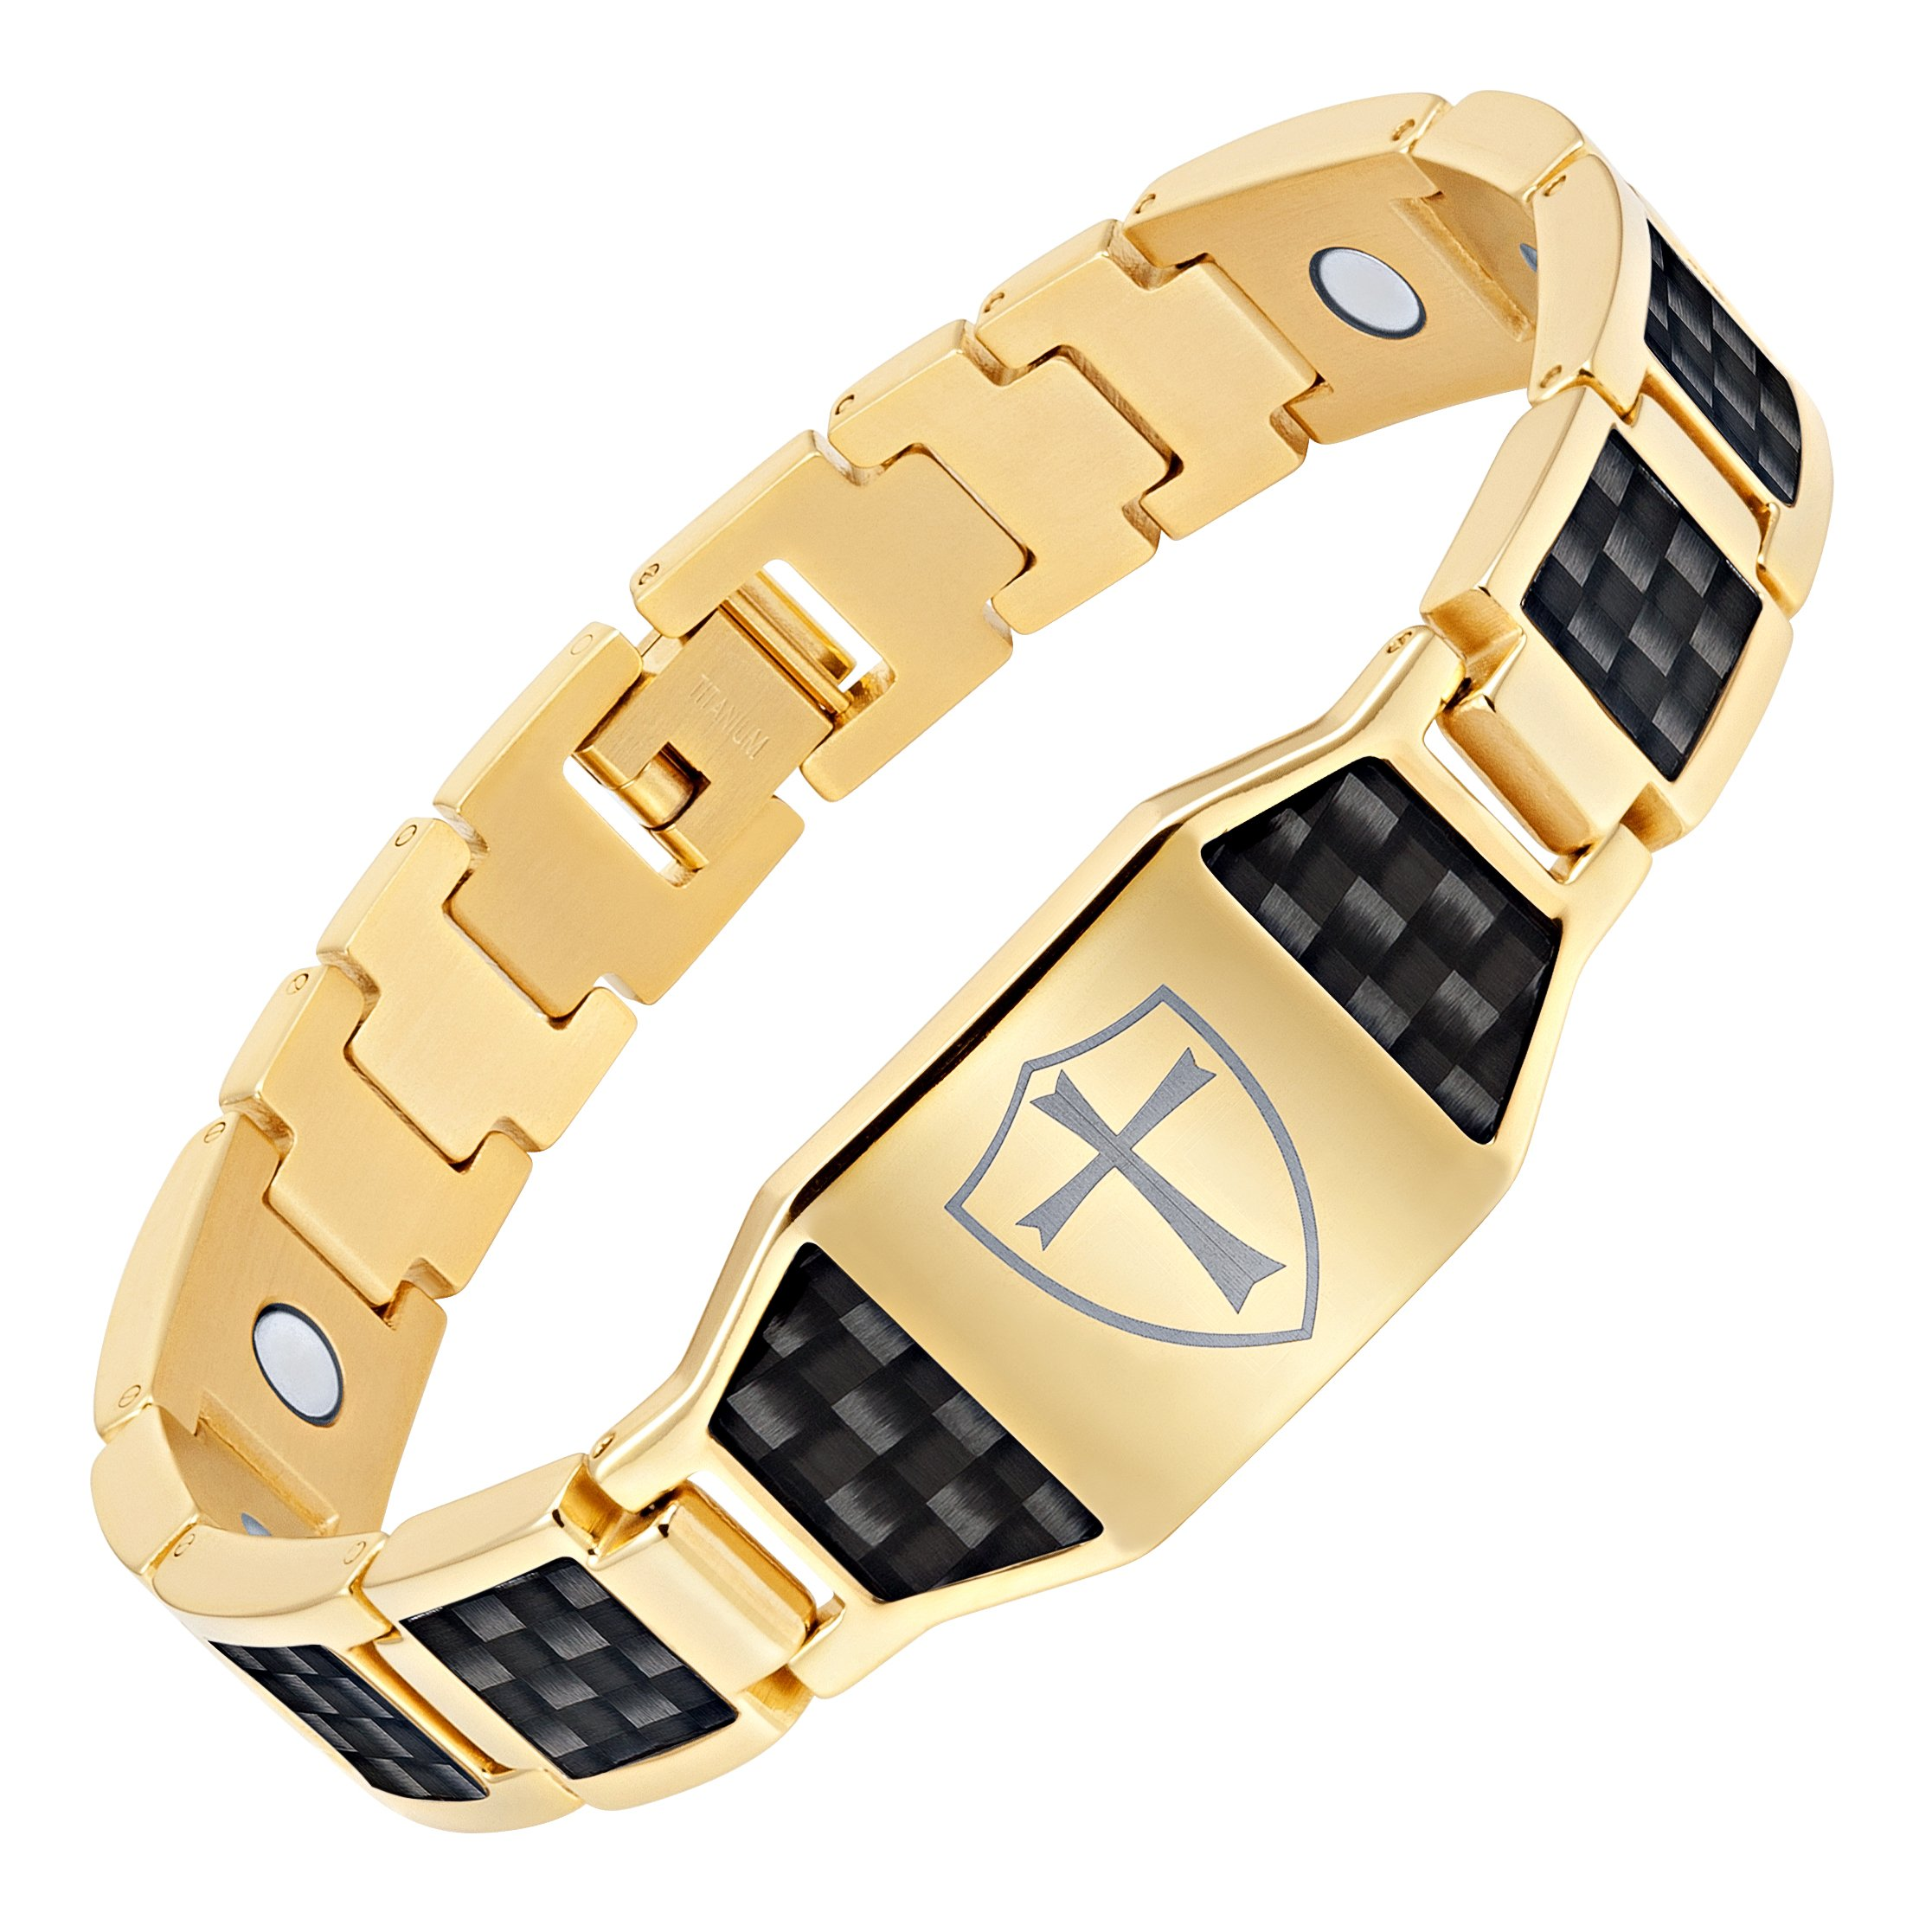 Willis Judd Men's Knights Templar Cross Shield Magnetic Bracelet with Black Carbon Fiber